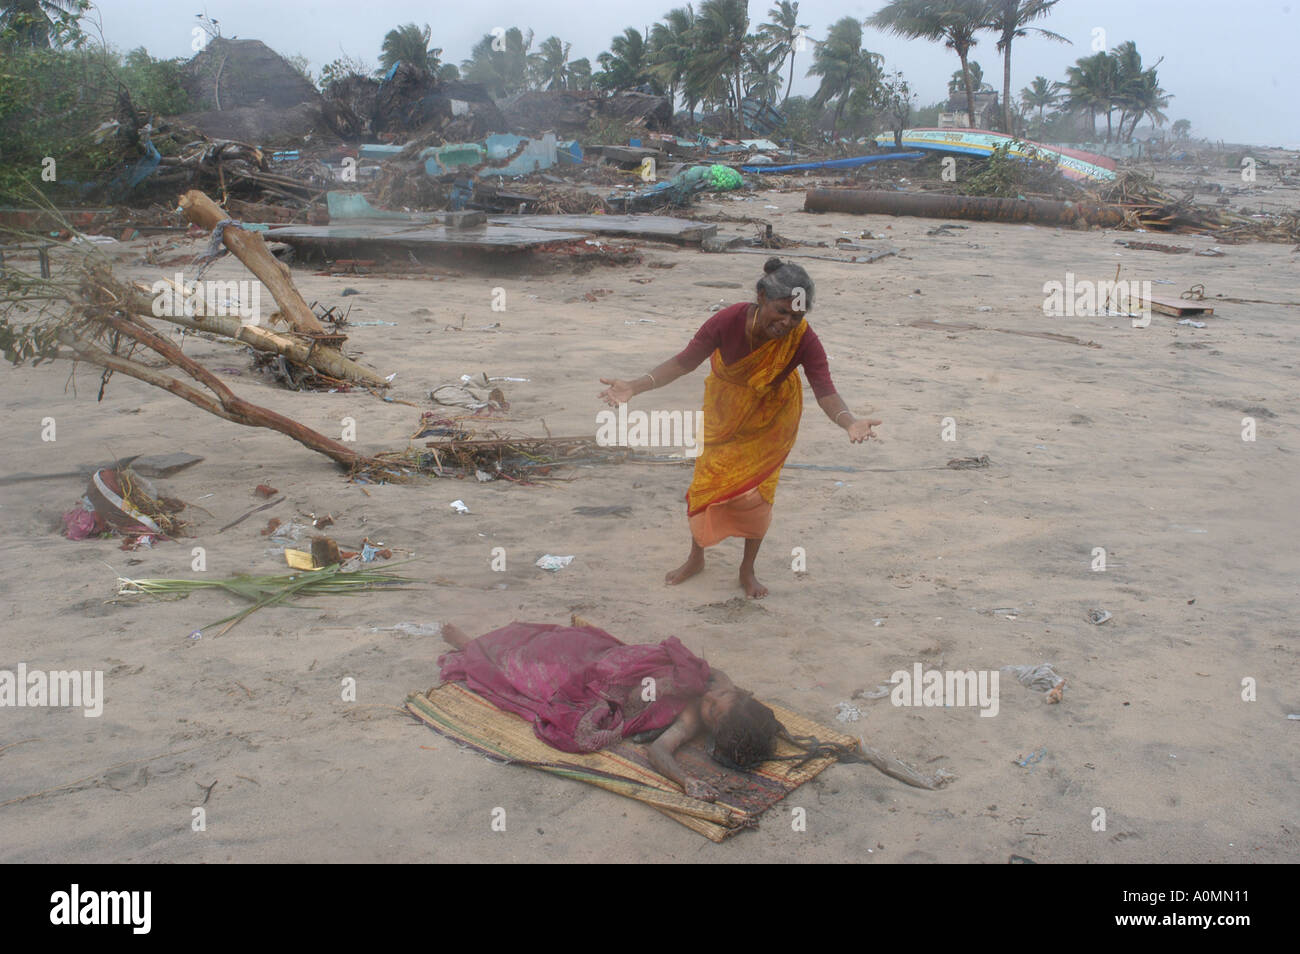 Indian Ocean Earthquake And Tsunami Natural Disasters